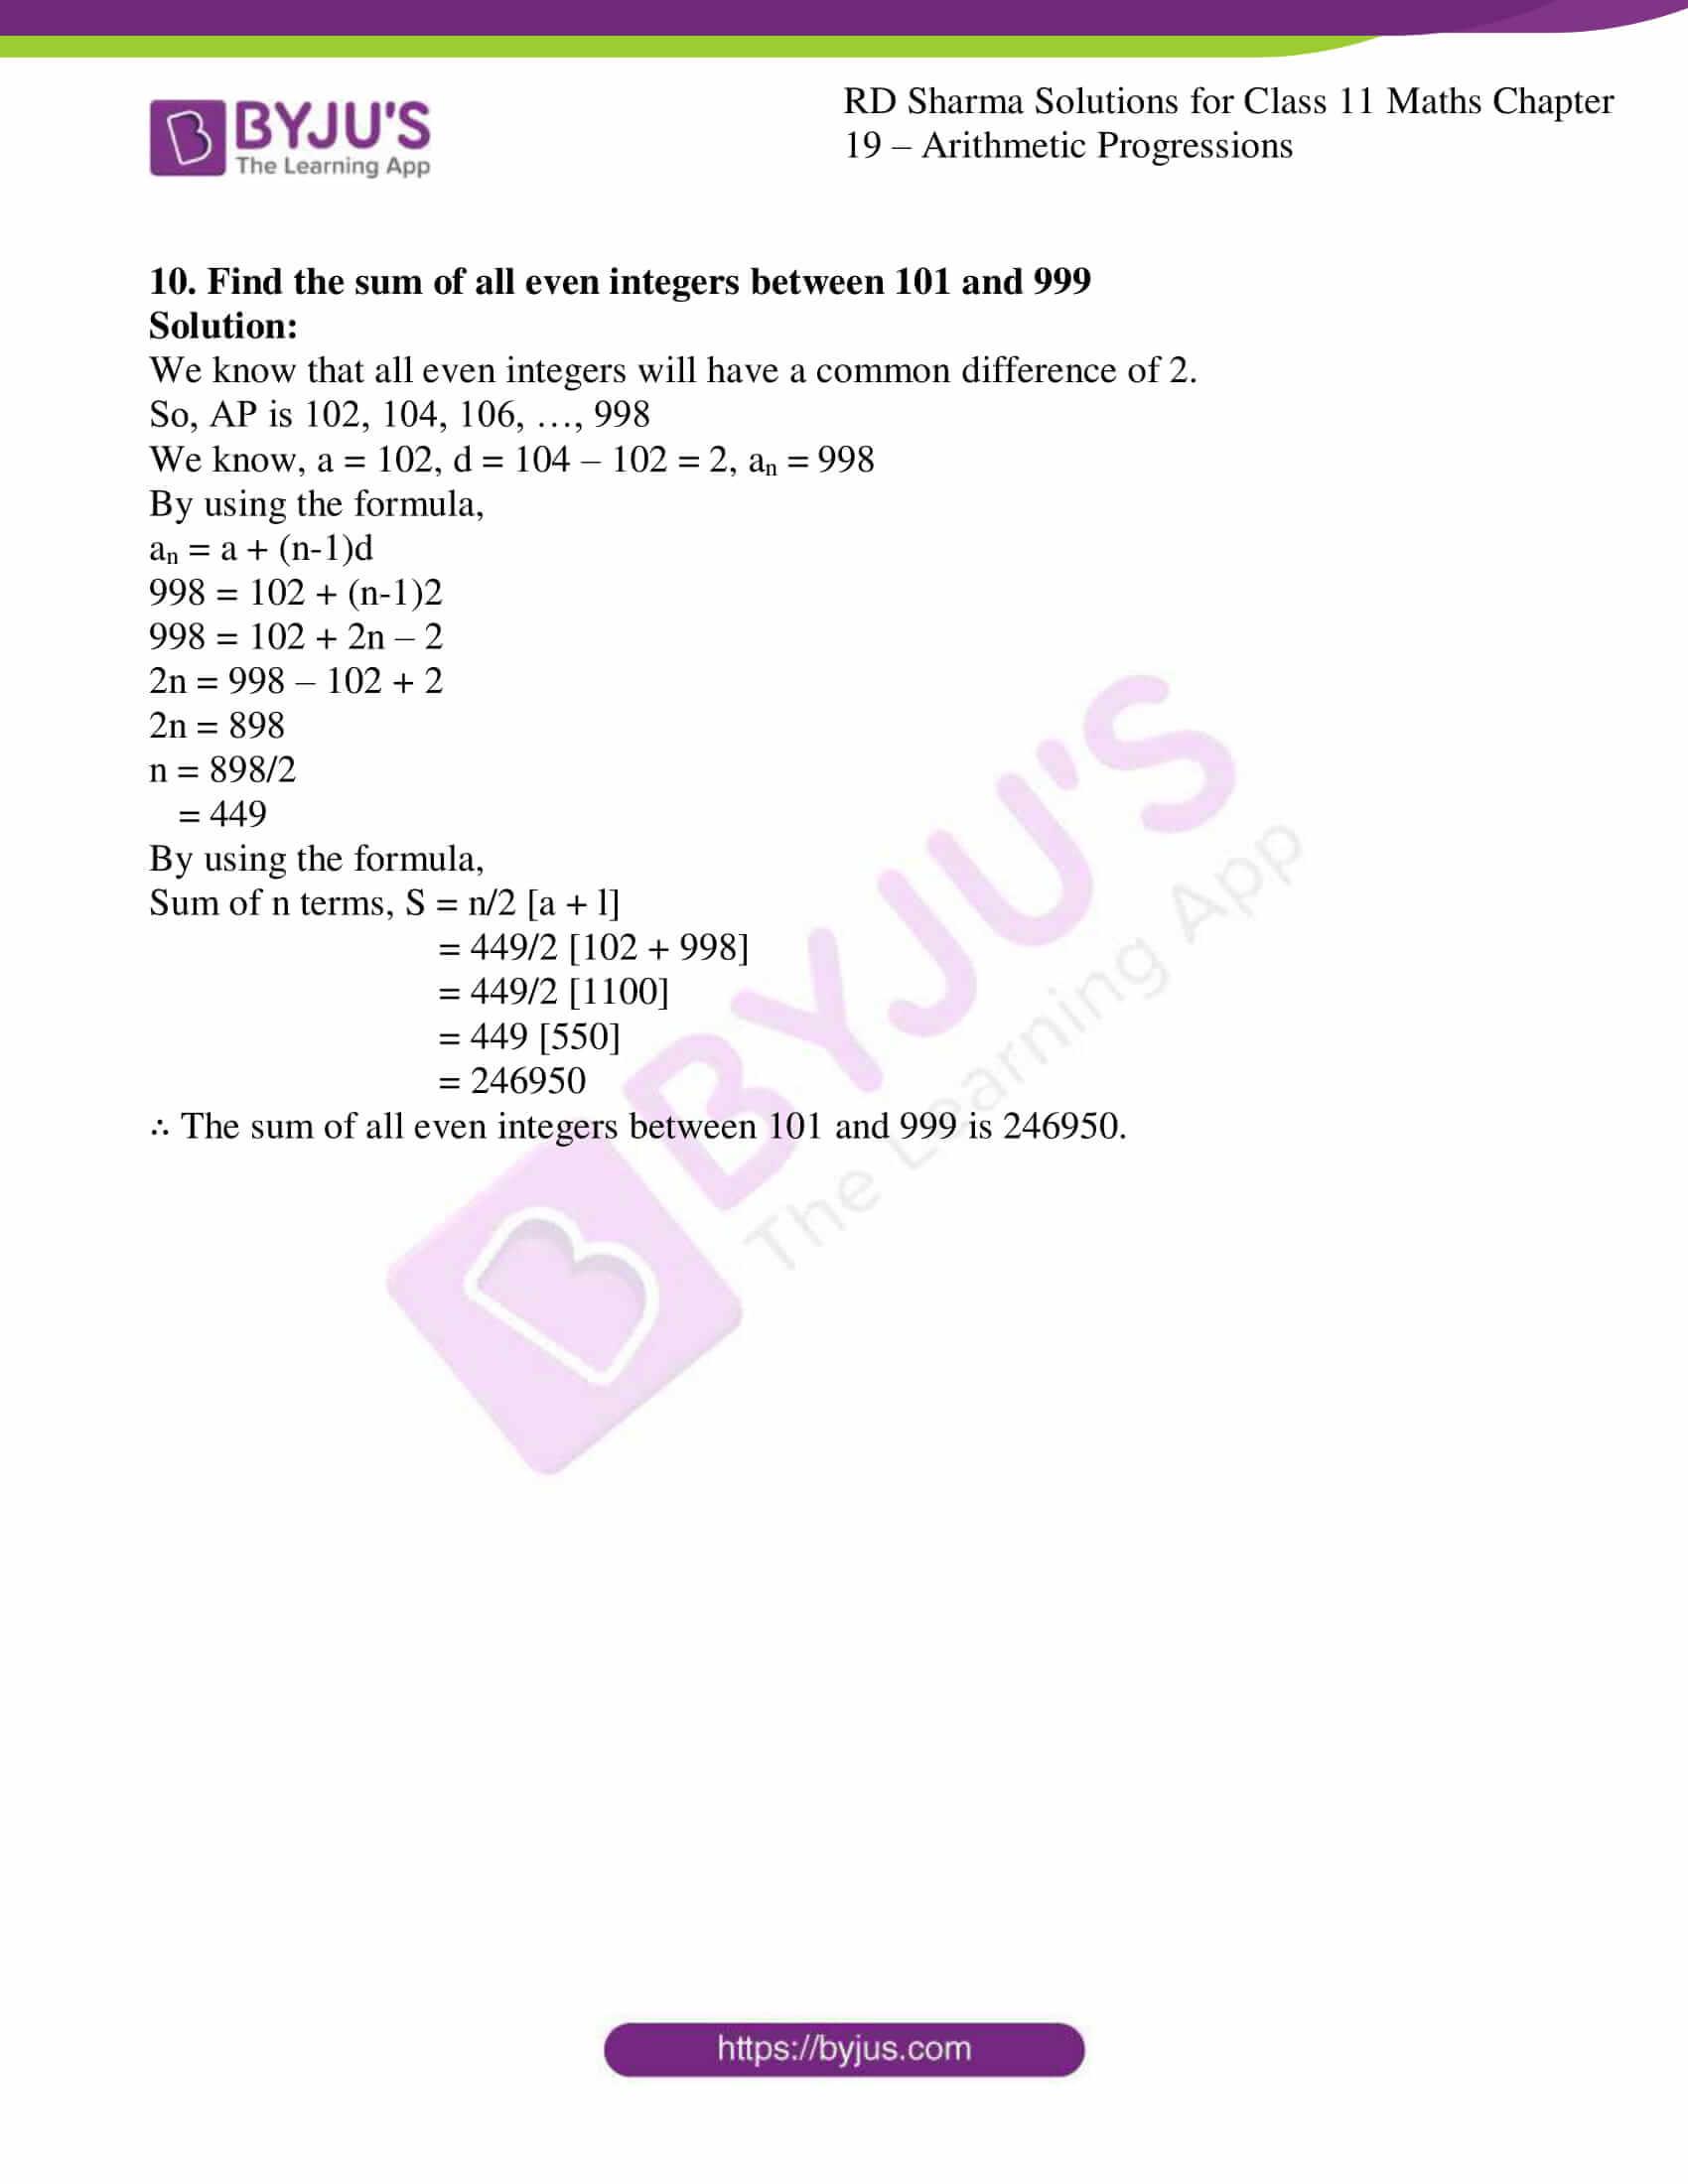 rd sharma class 11 maths ch 19 ex 4 9